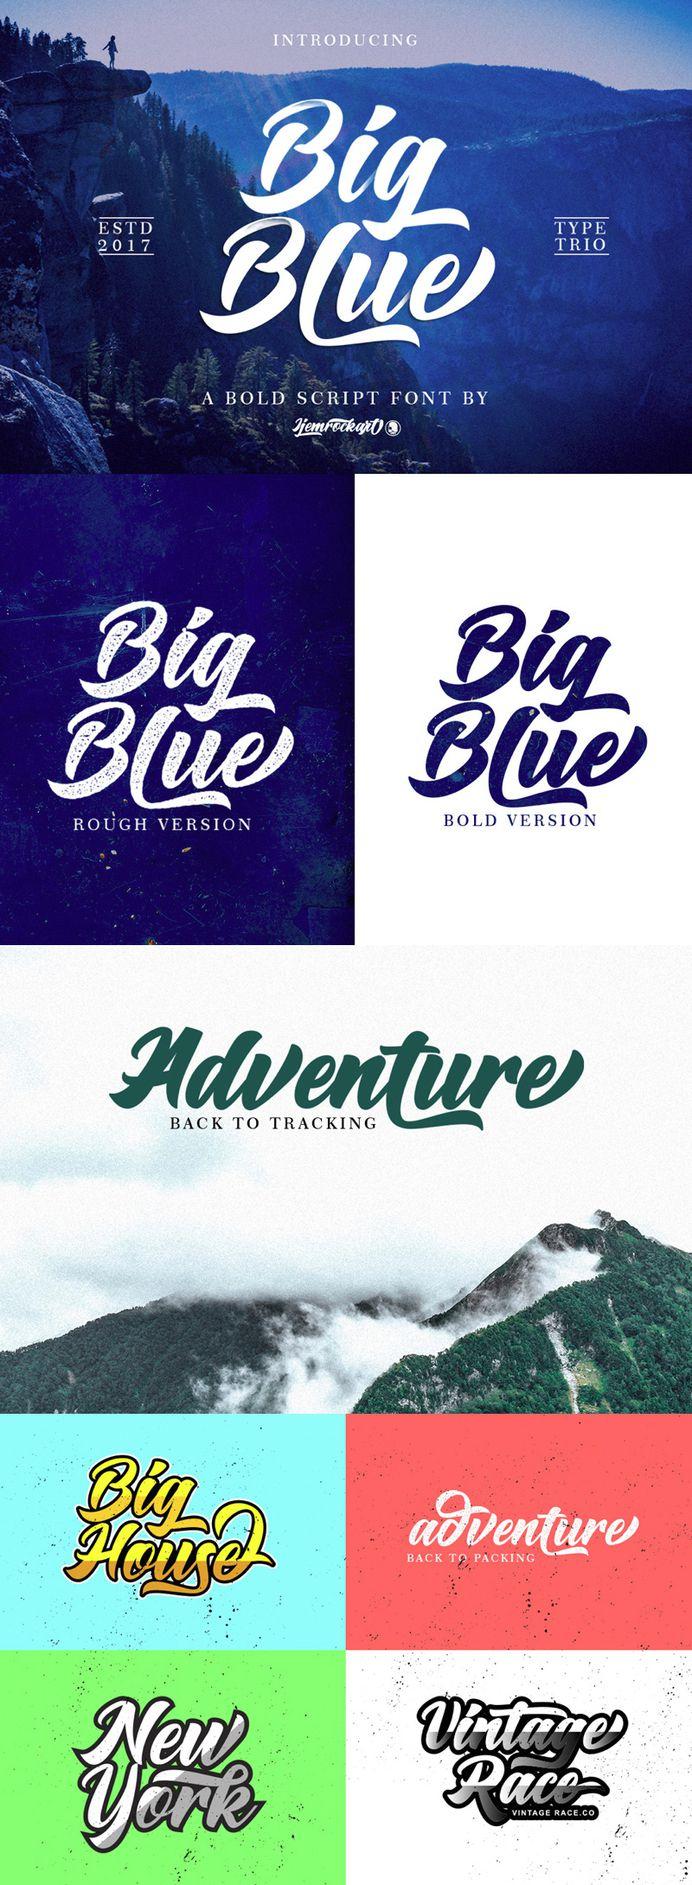 Big Blue Font - Bold Script Typeface